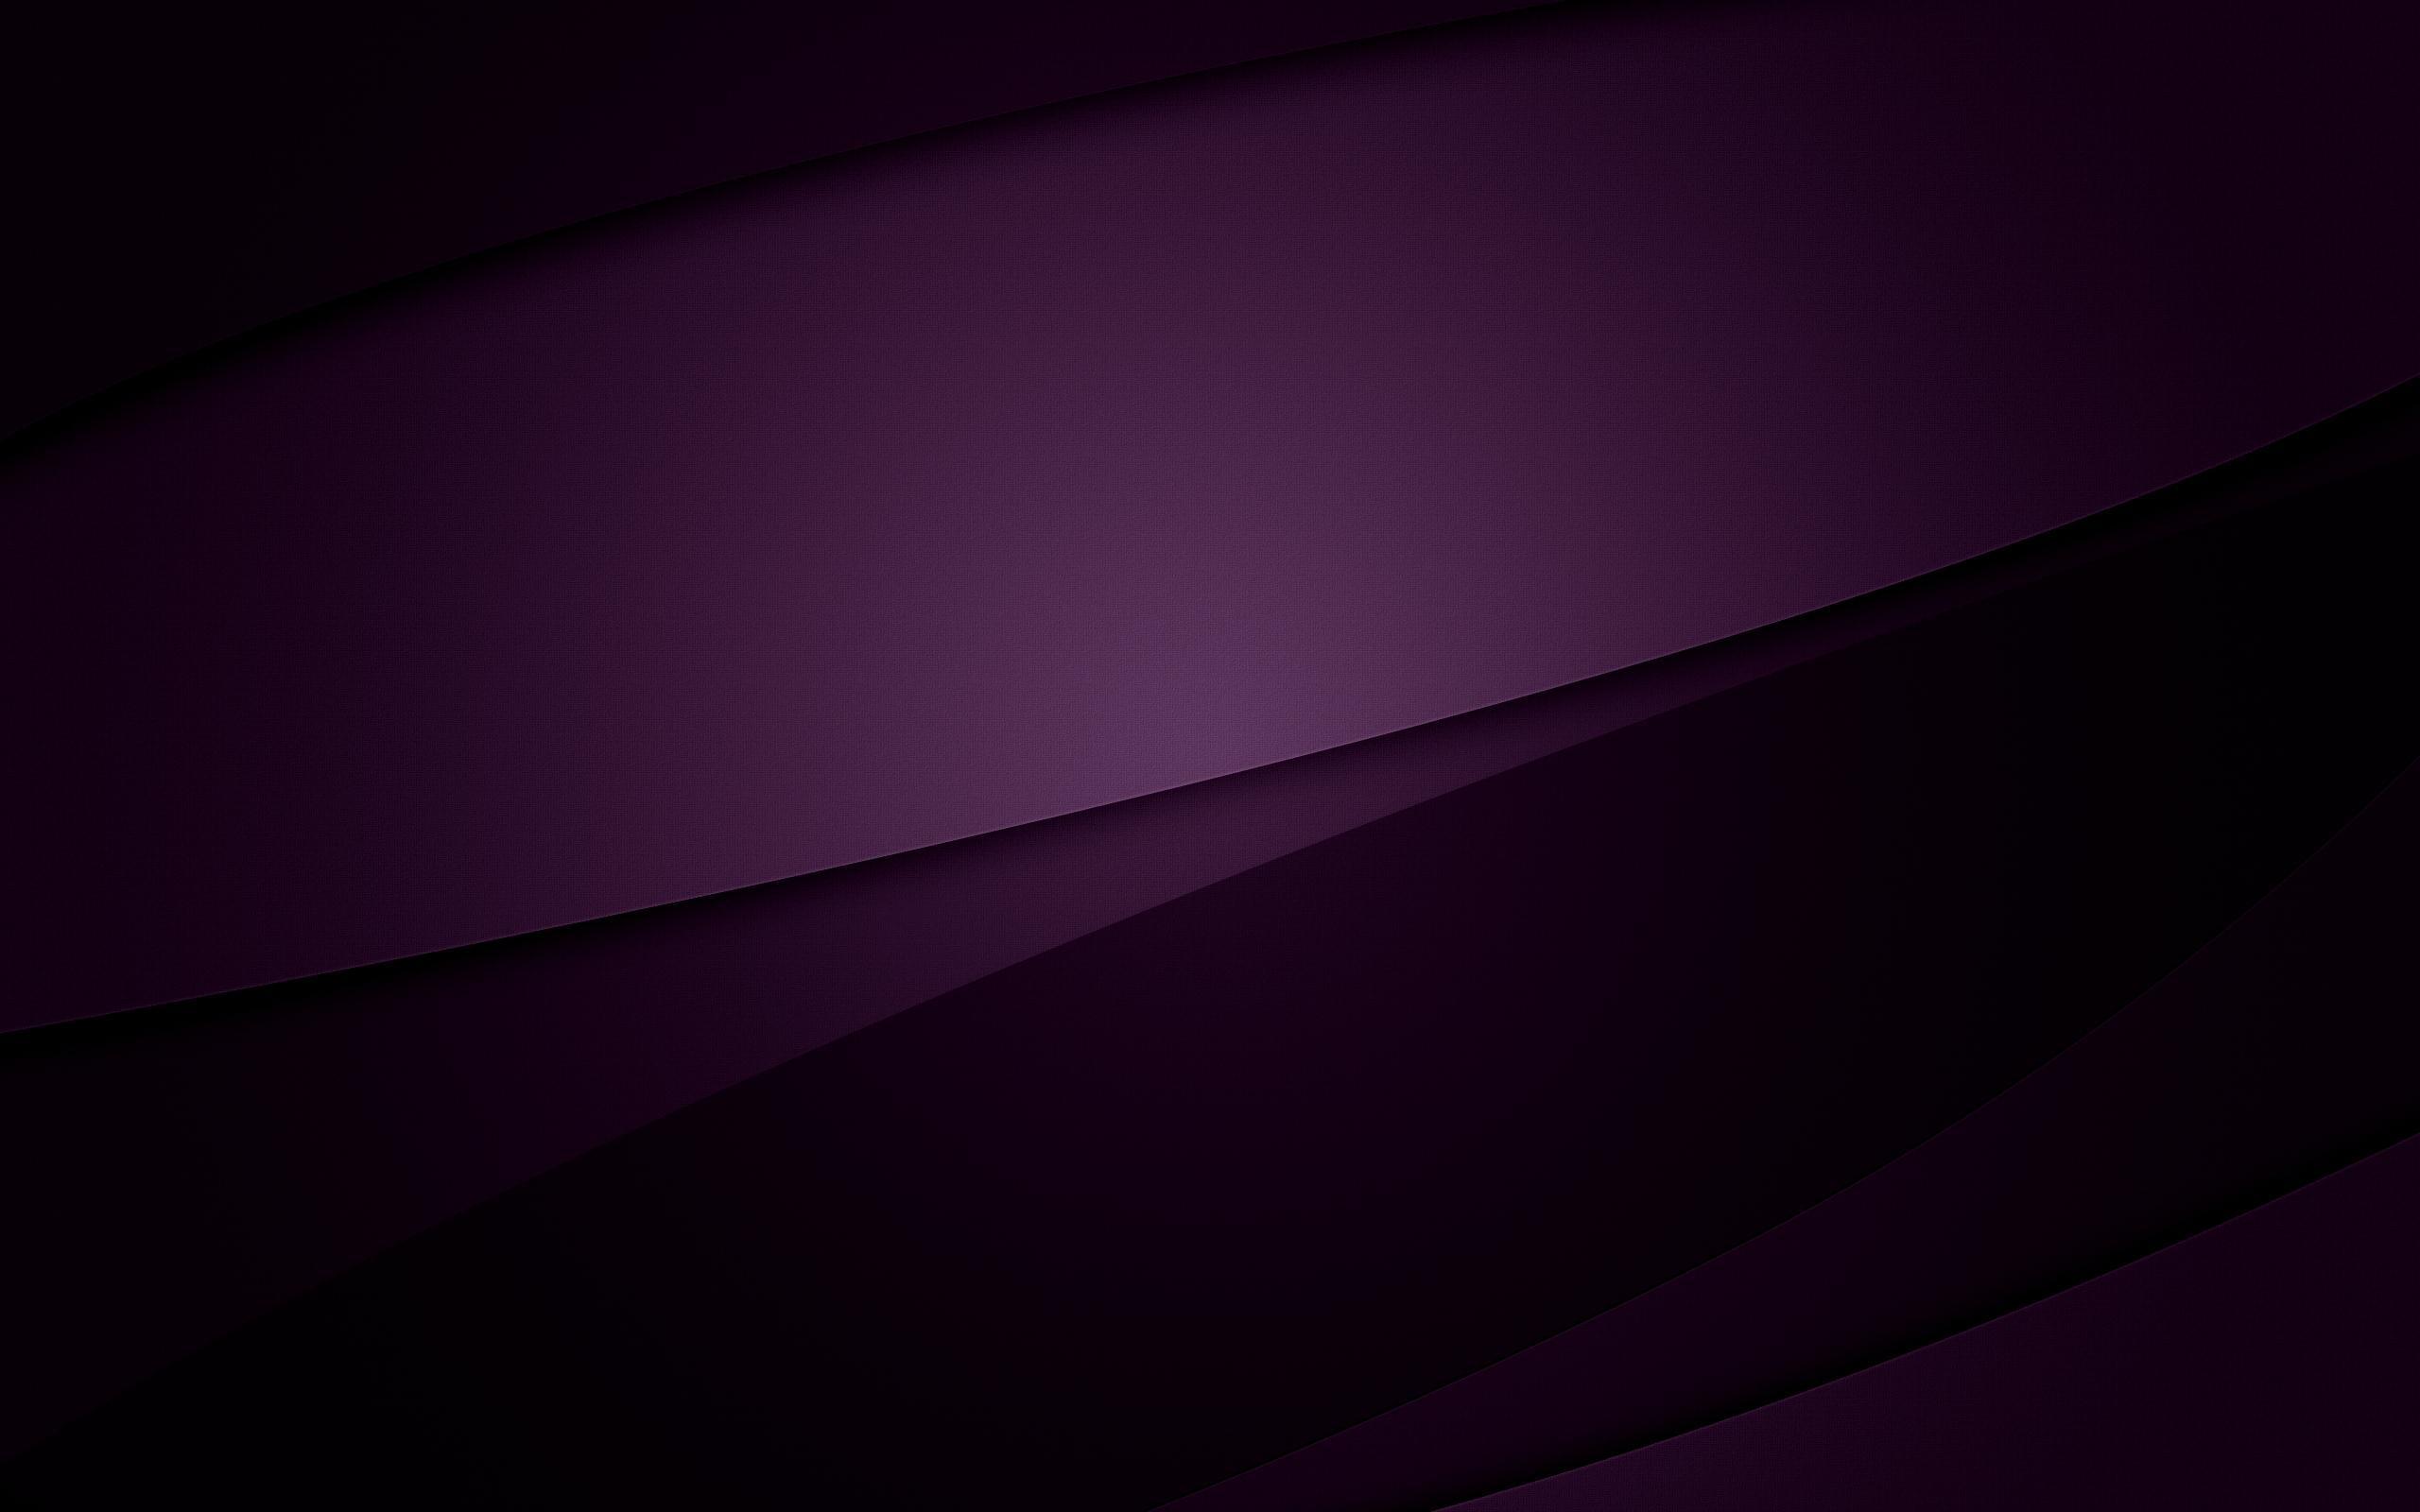 purple background 40202